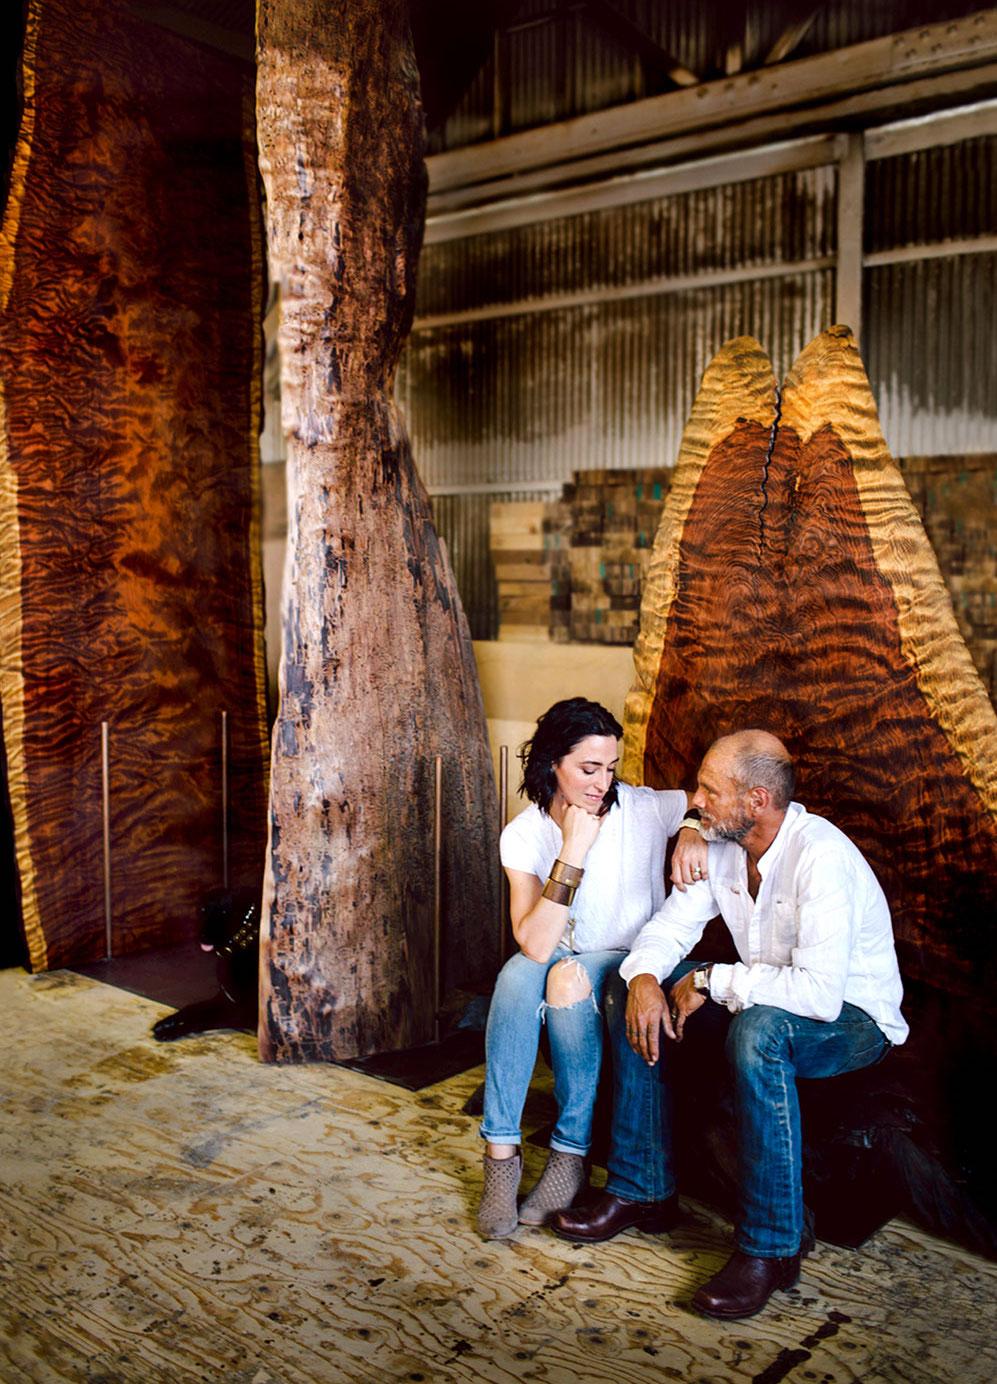 redwoods-&-love-web.jpg